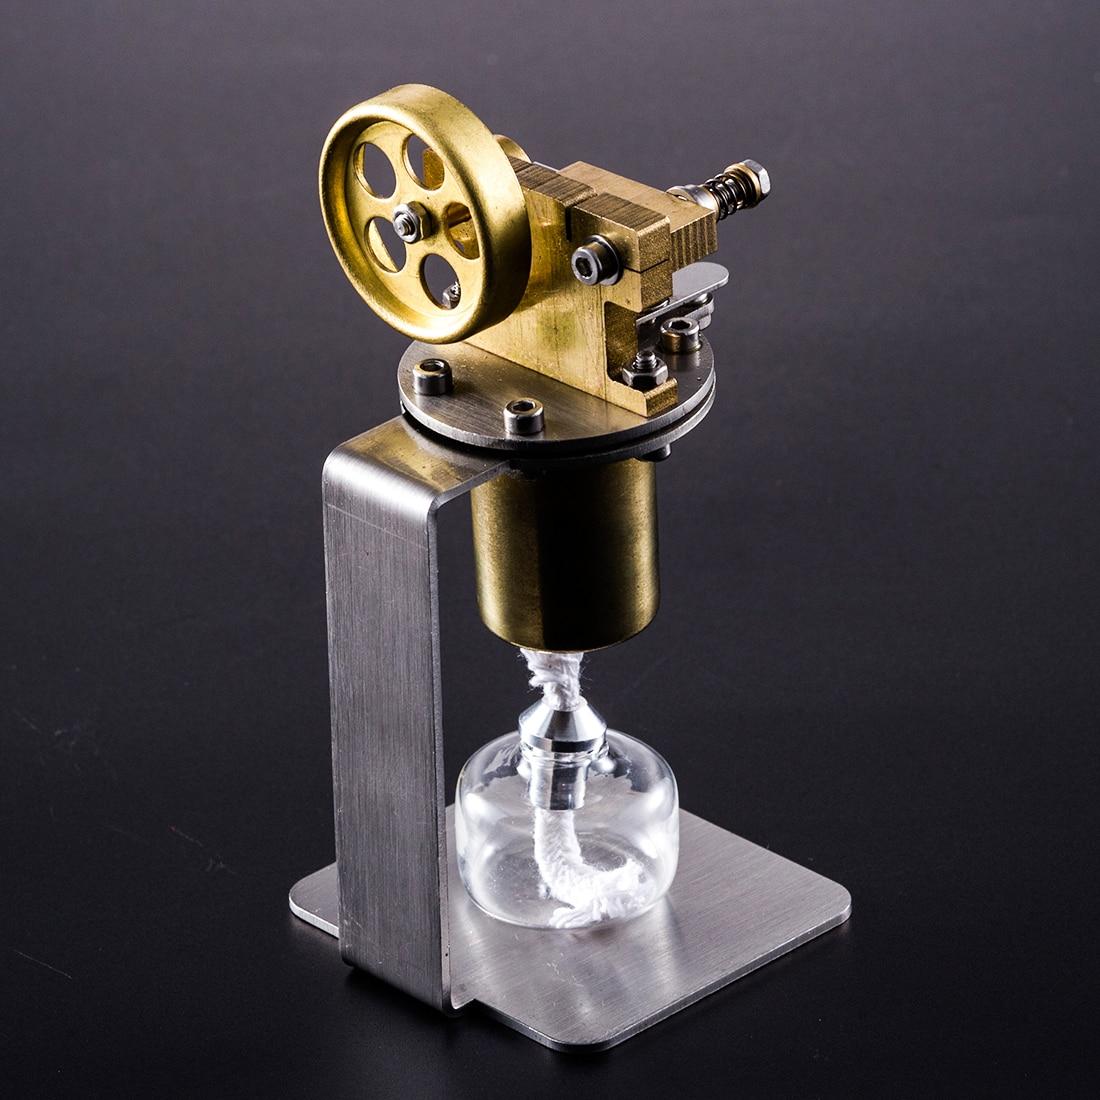 Us 58 47 47 Off All Metal Horizontal Single Cylinder Diy Steam Engine Stem Model Set Early Building Kits Learning Model Toys For Children In Model